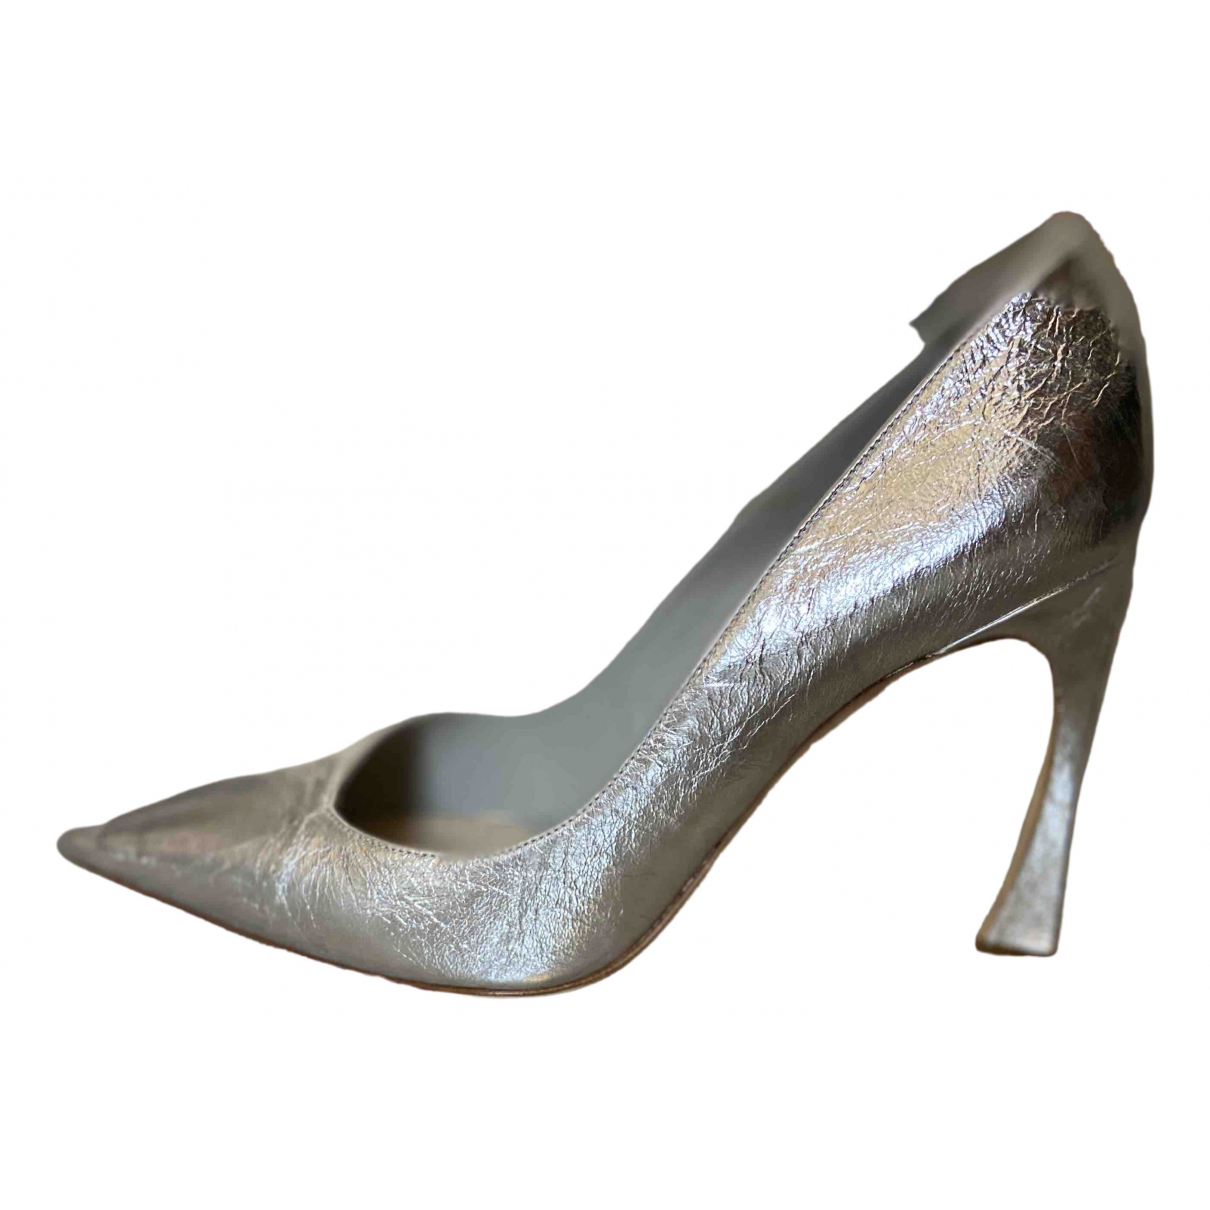 Dior Dior D-Stiletto Silver Leather Heels for Women 40 EU